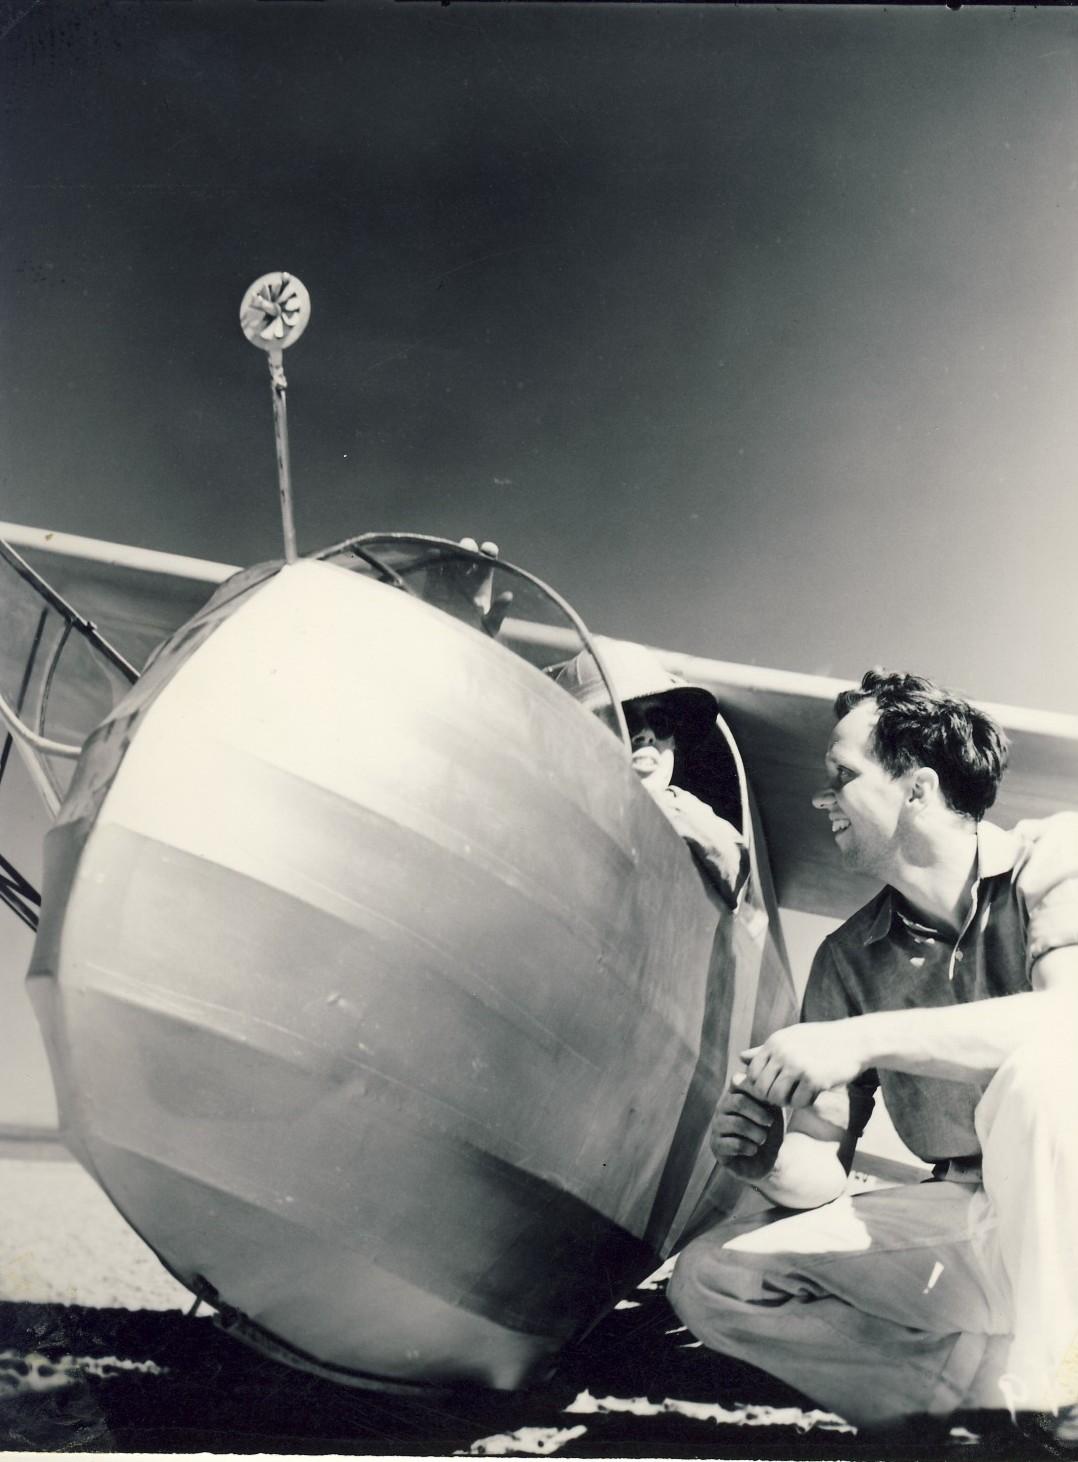 bg-6-_-wheel-airspeed-indicator